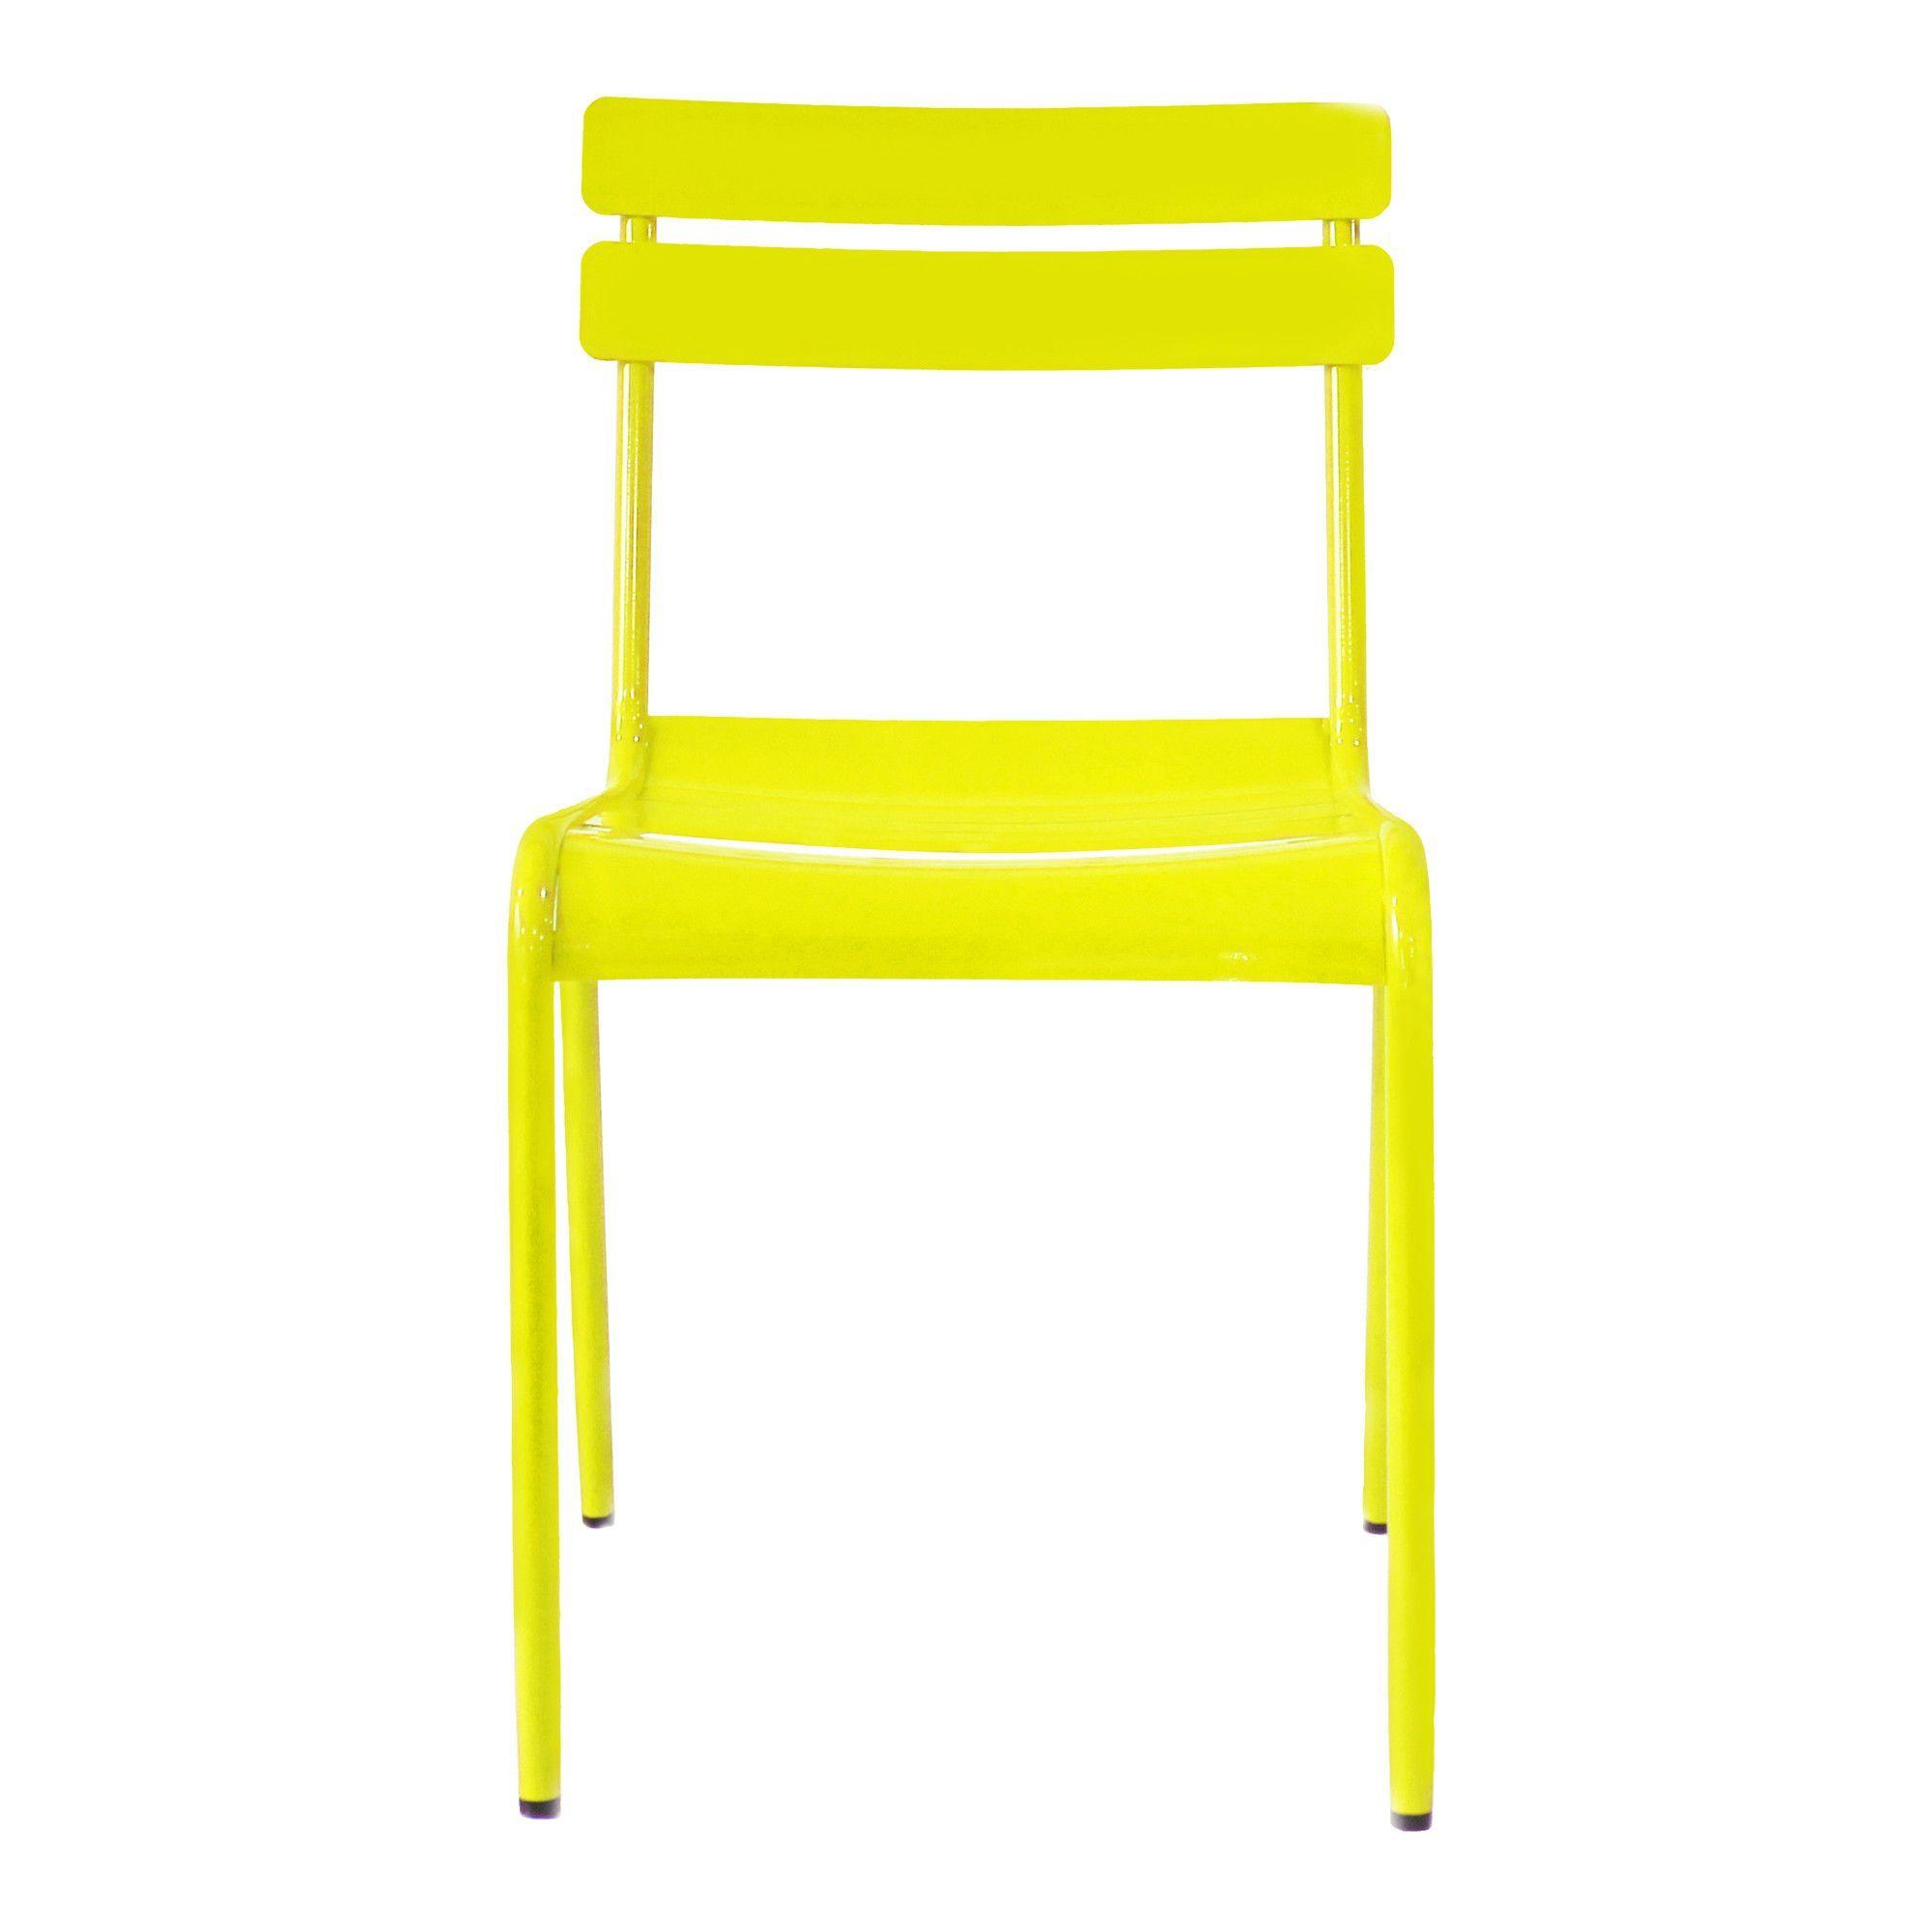 Gordman Accent Chairs.Gordon Side Chair Products Side Chairs Chair Yellow Accent Chairs